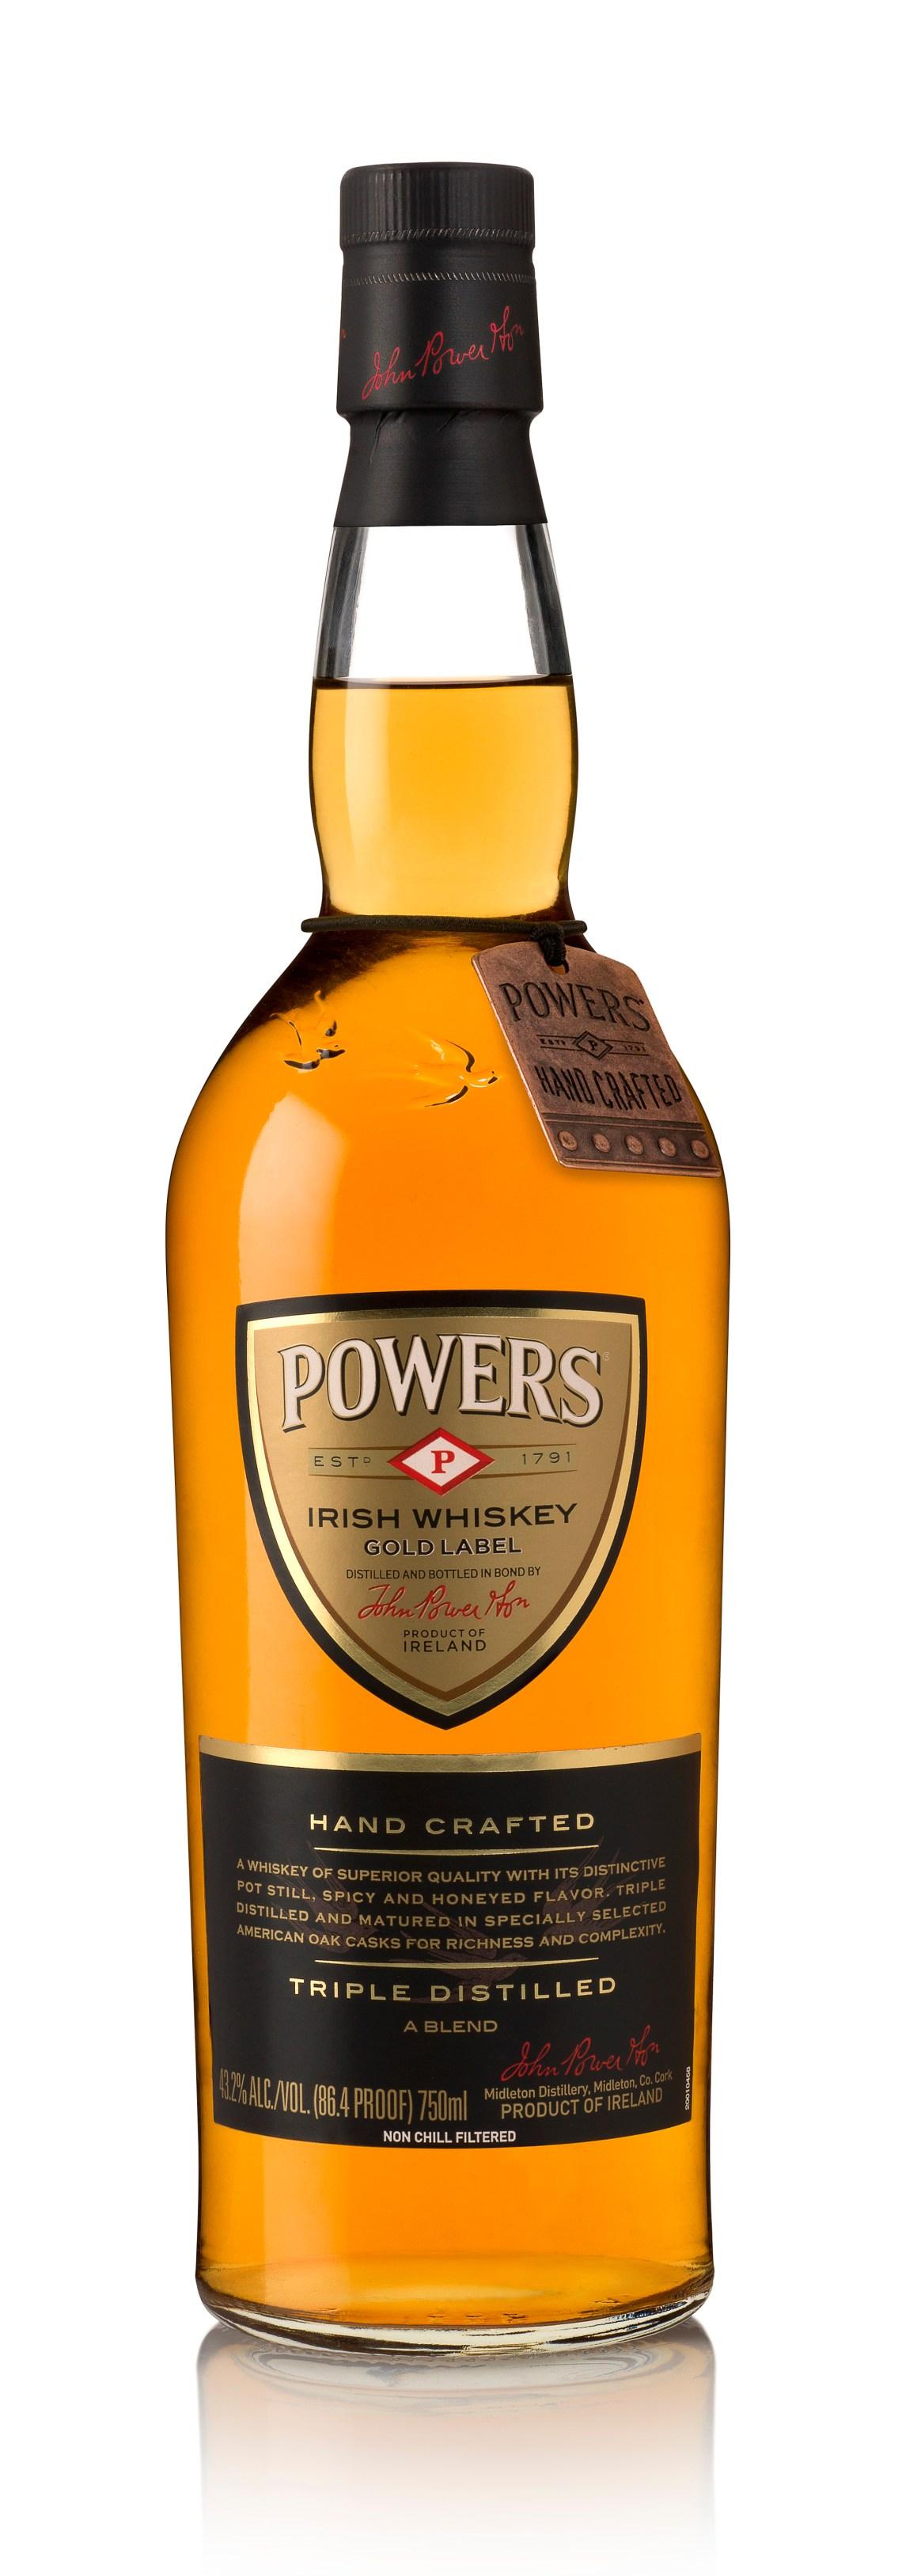 Powers Gold Label Irish Whiskey (2014)